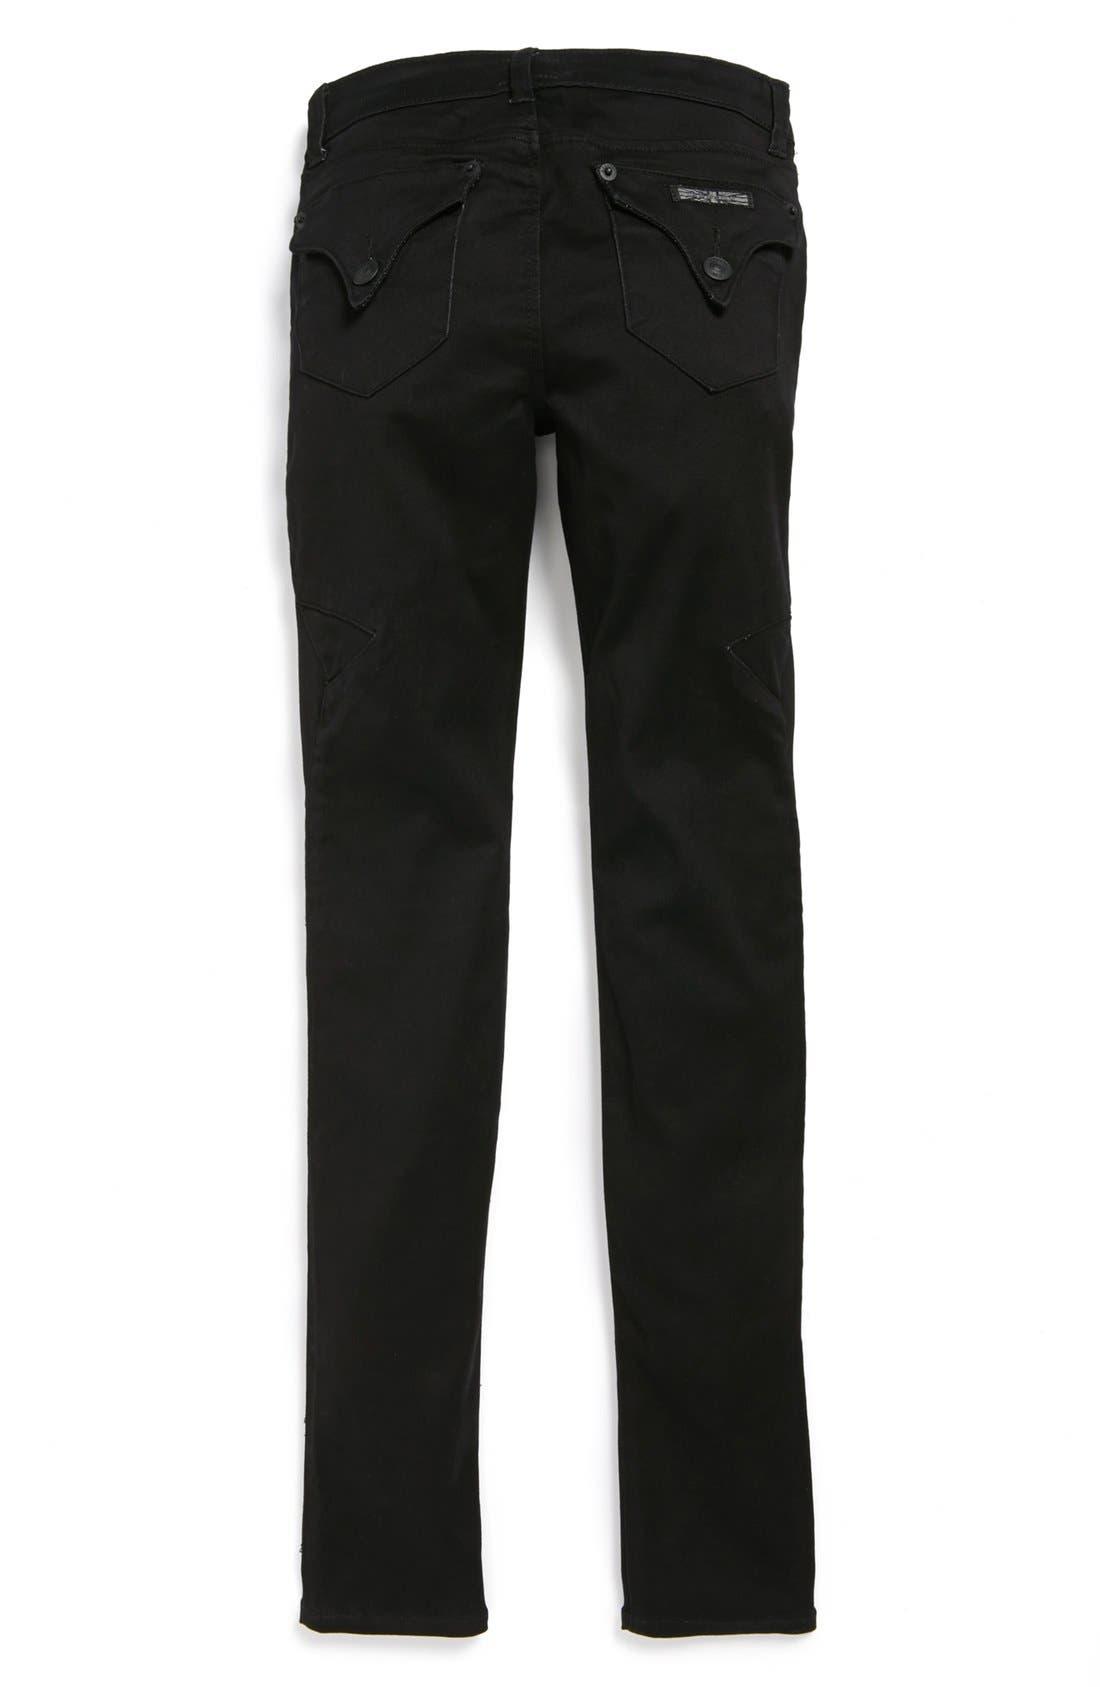 Main Image - Hudson Kids 'Moto' Skinny Jeans (Big Girls)